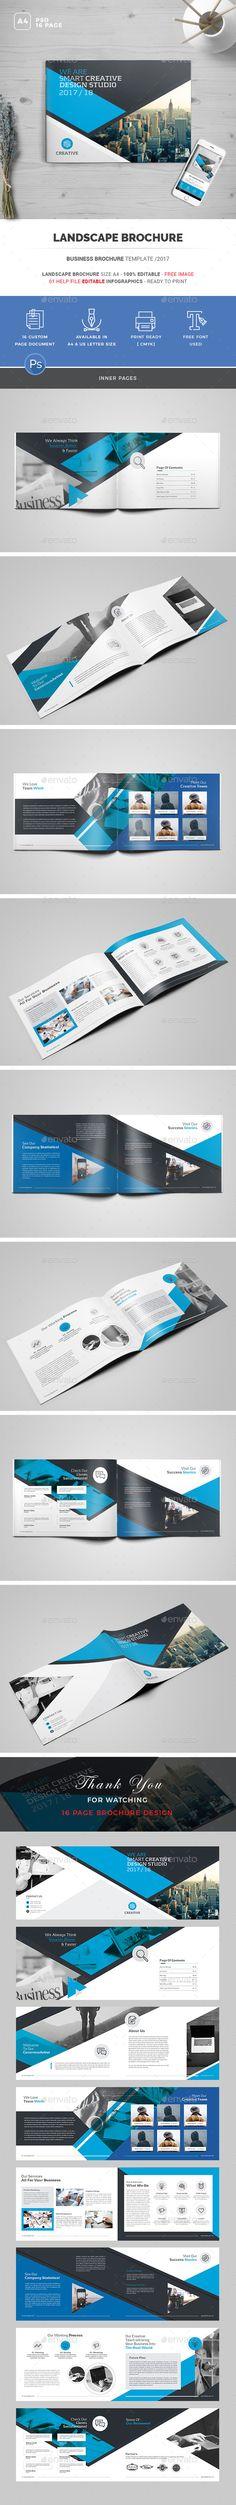 Busines Landscape Brochure Template PSD